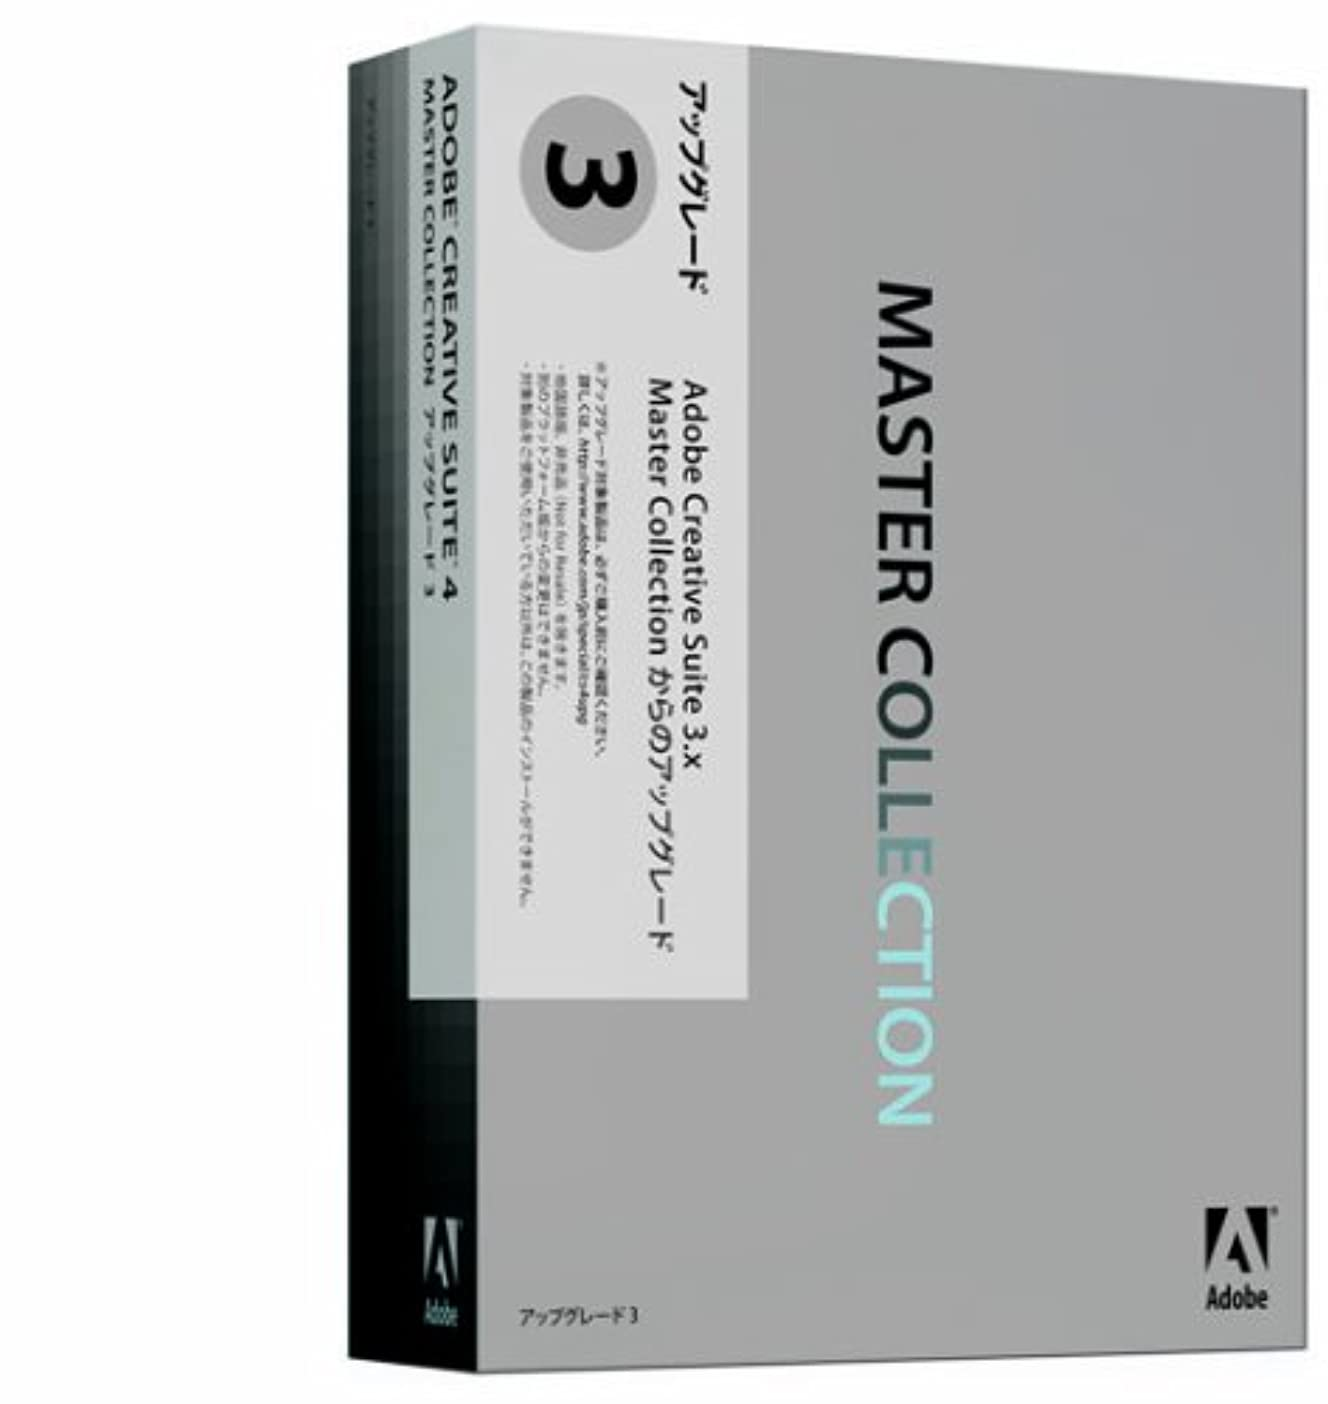 Adobe Creative Suite 4 Master Collection 日本語版 アップグレード版3 (FROM CS3) Windows版